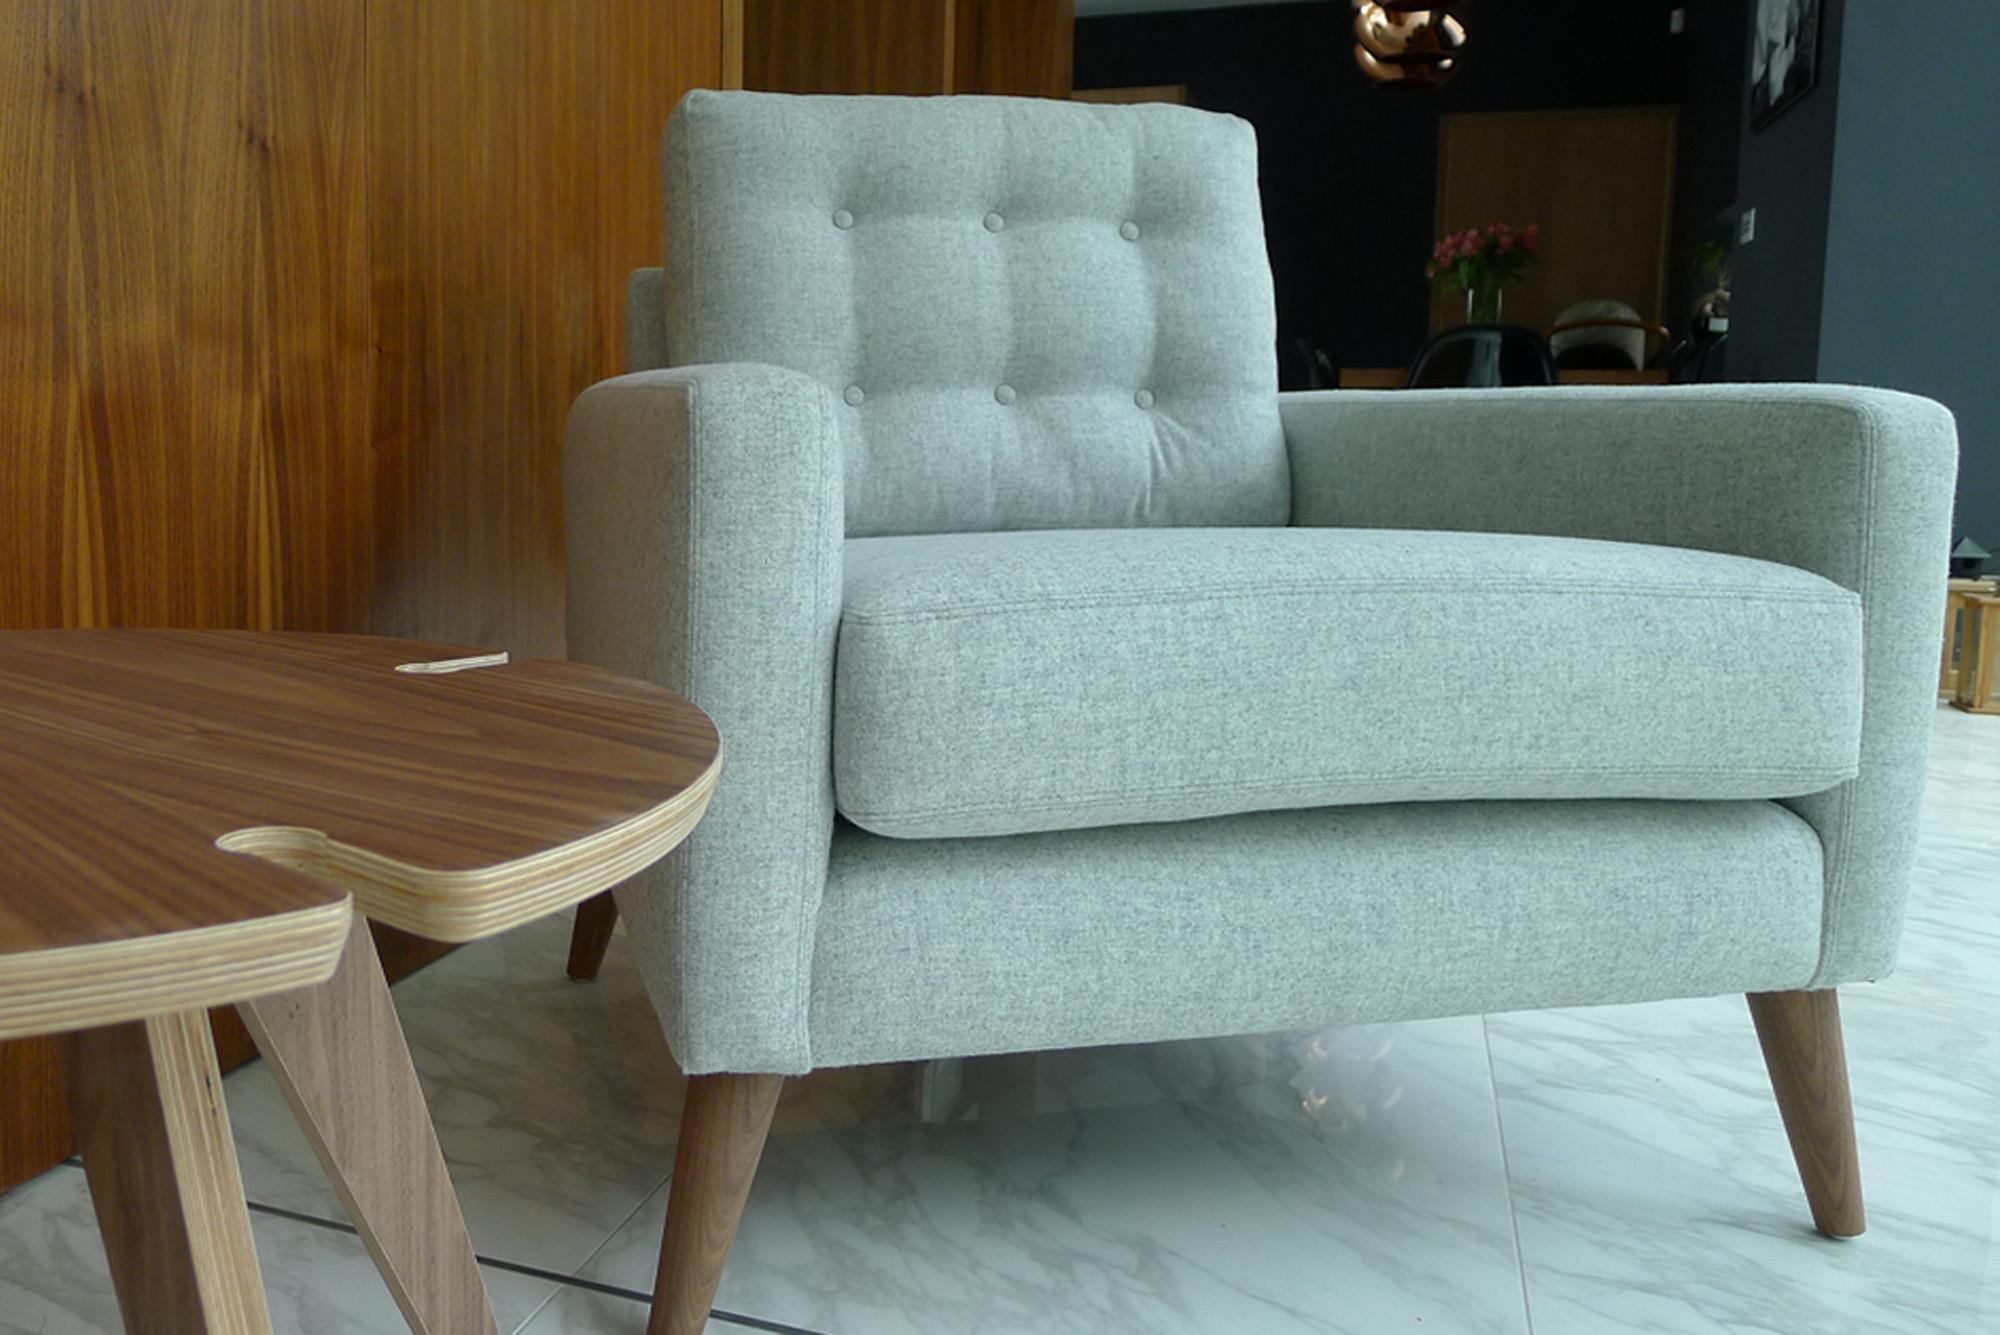 Independent furniture showroom